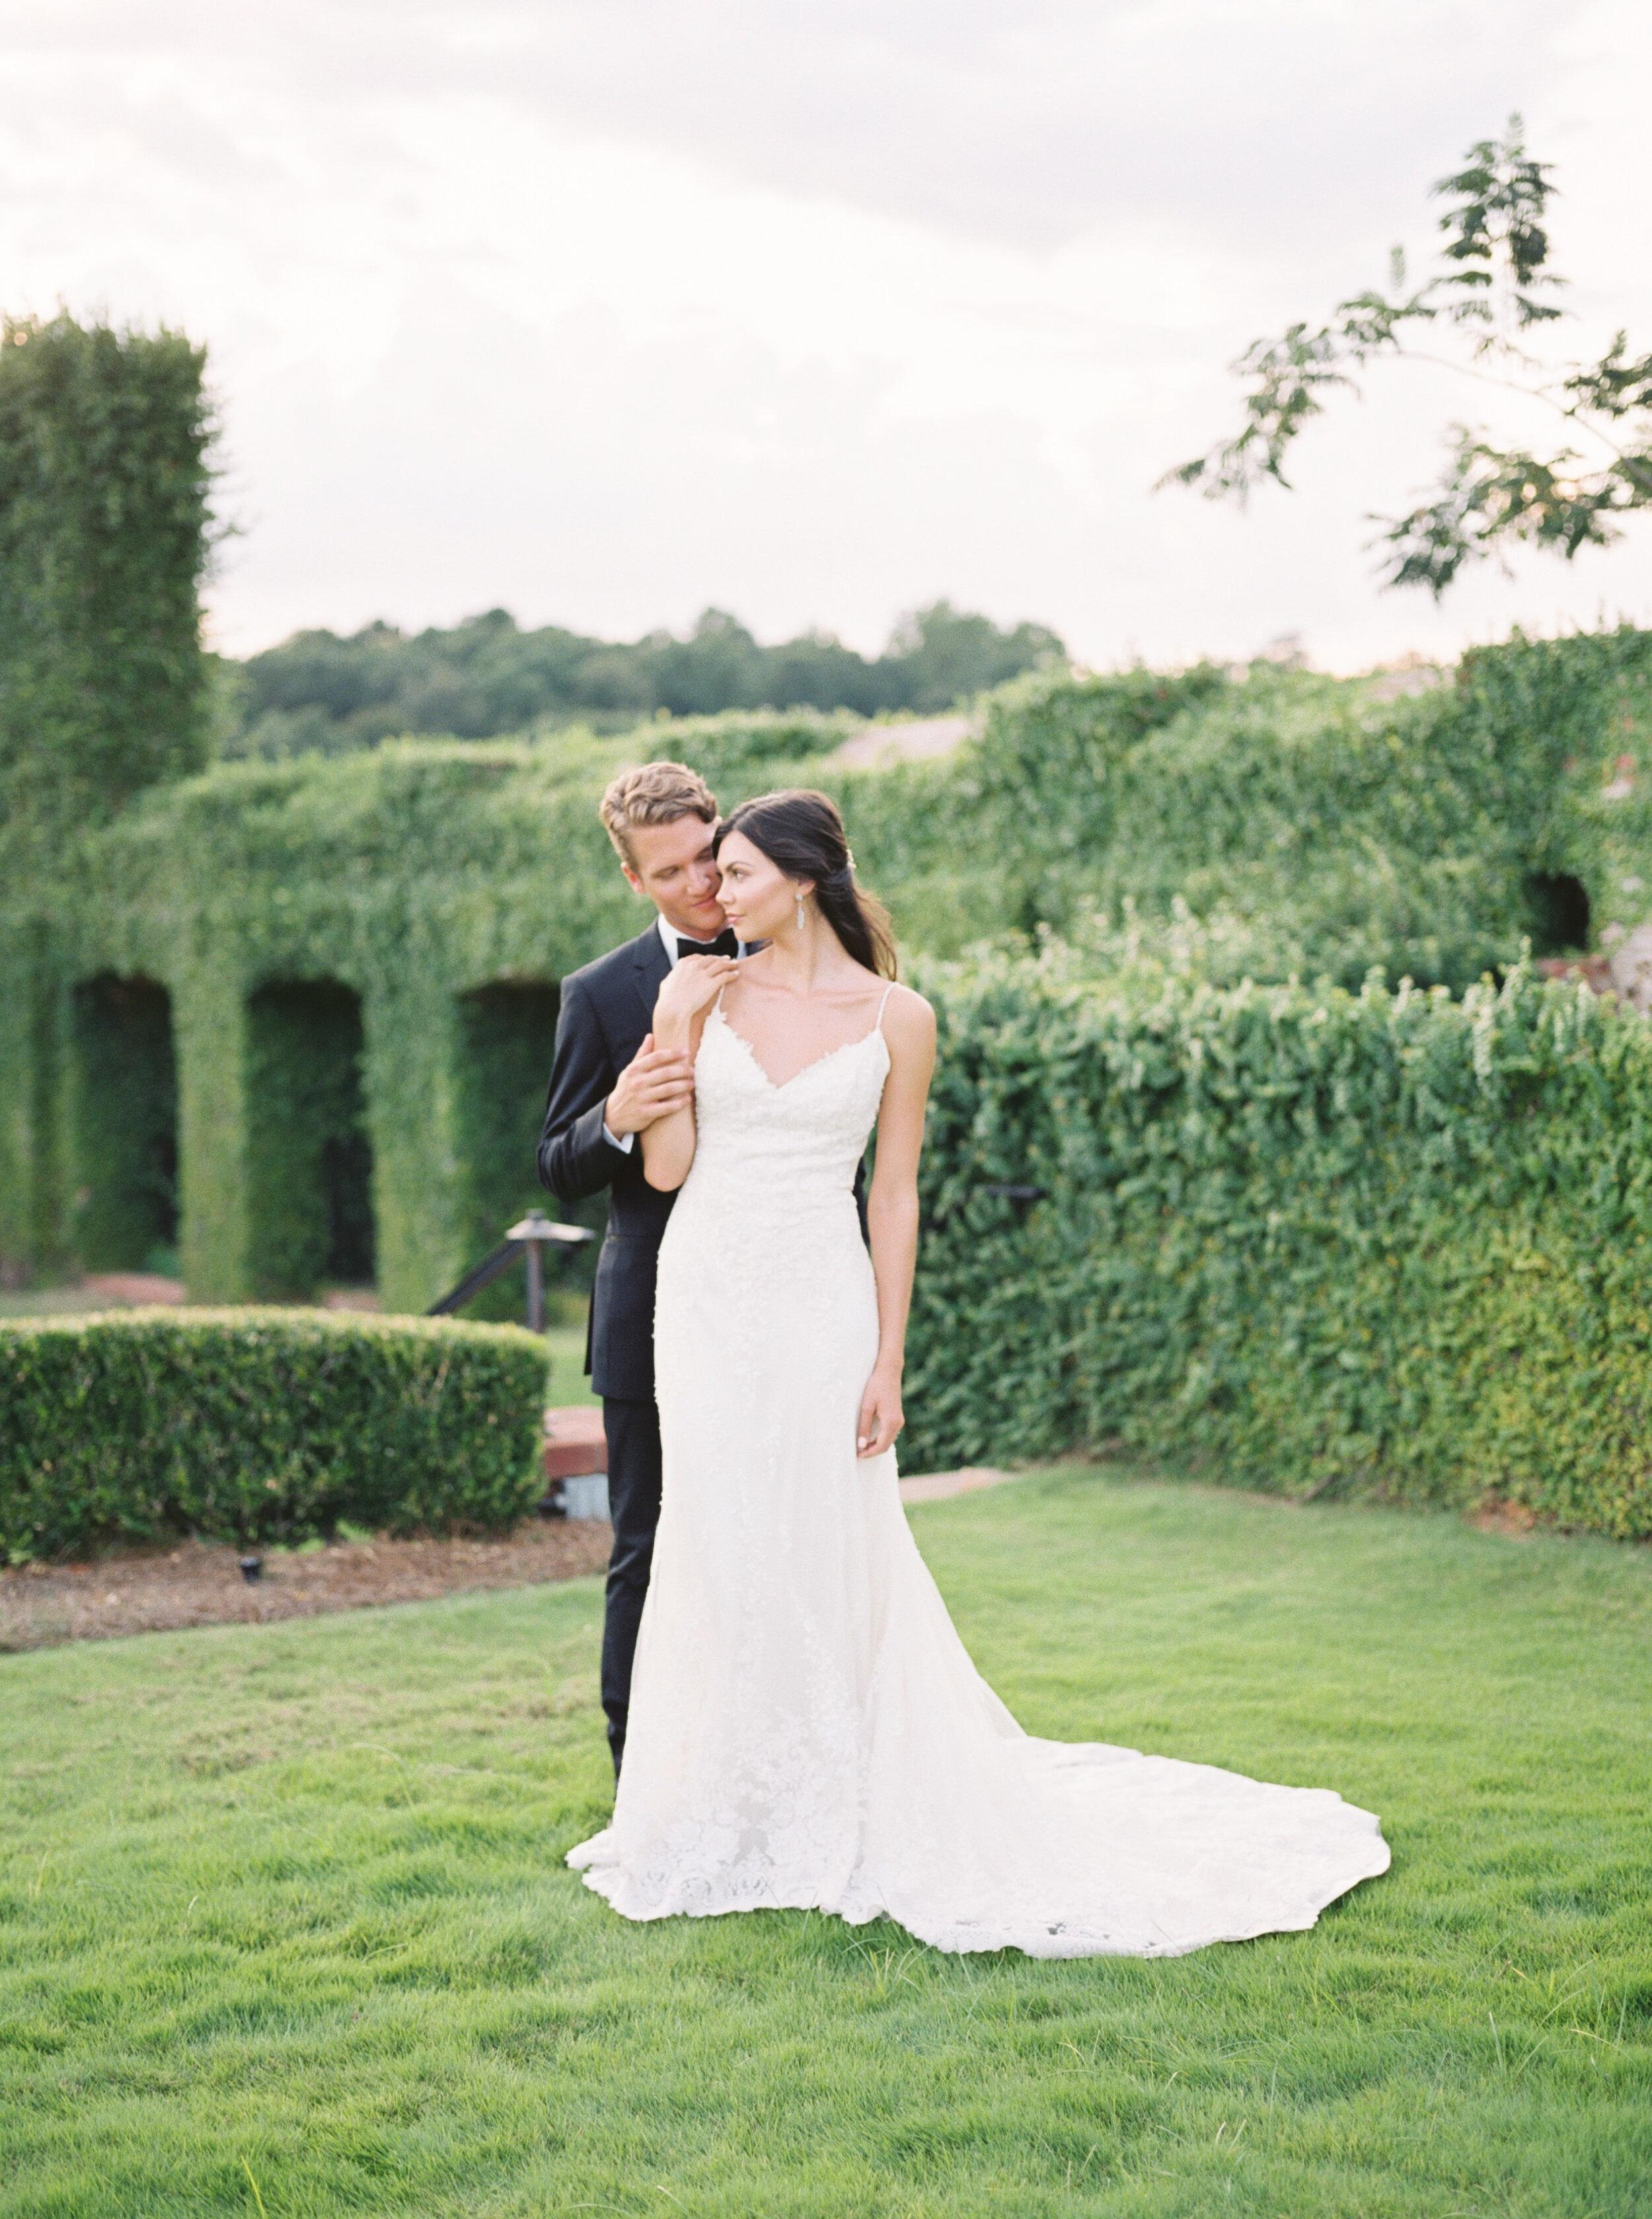 Bibb_Mill_Wedding_Editorial_Columbus_Georgia_Fallen_Photography_6-70.JPG